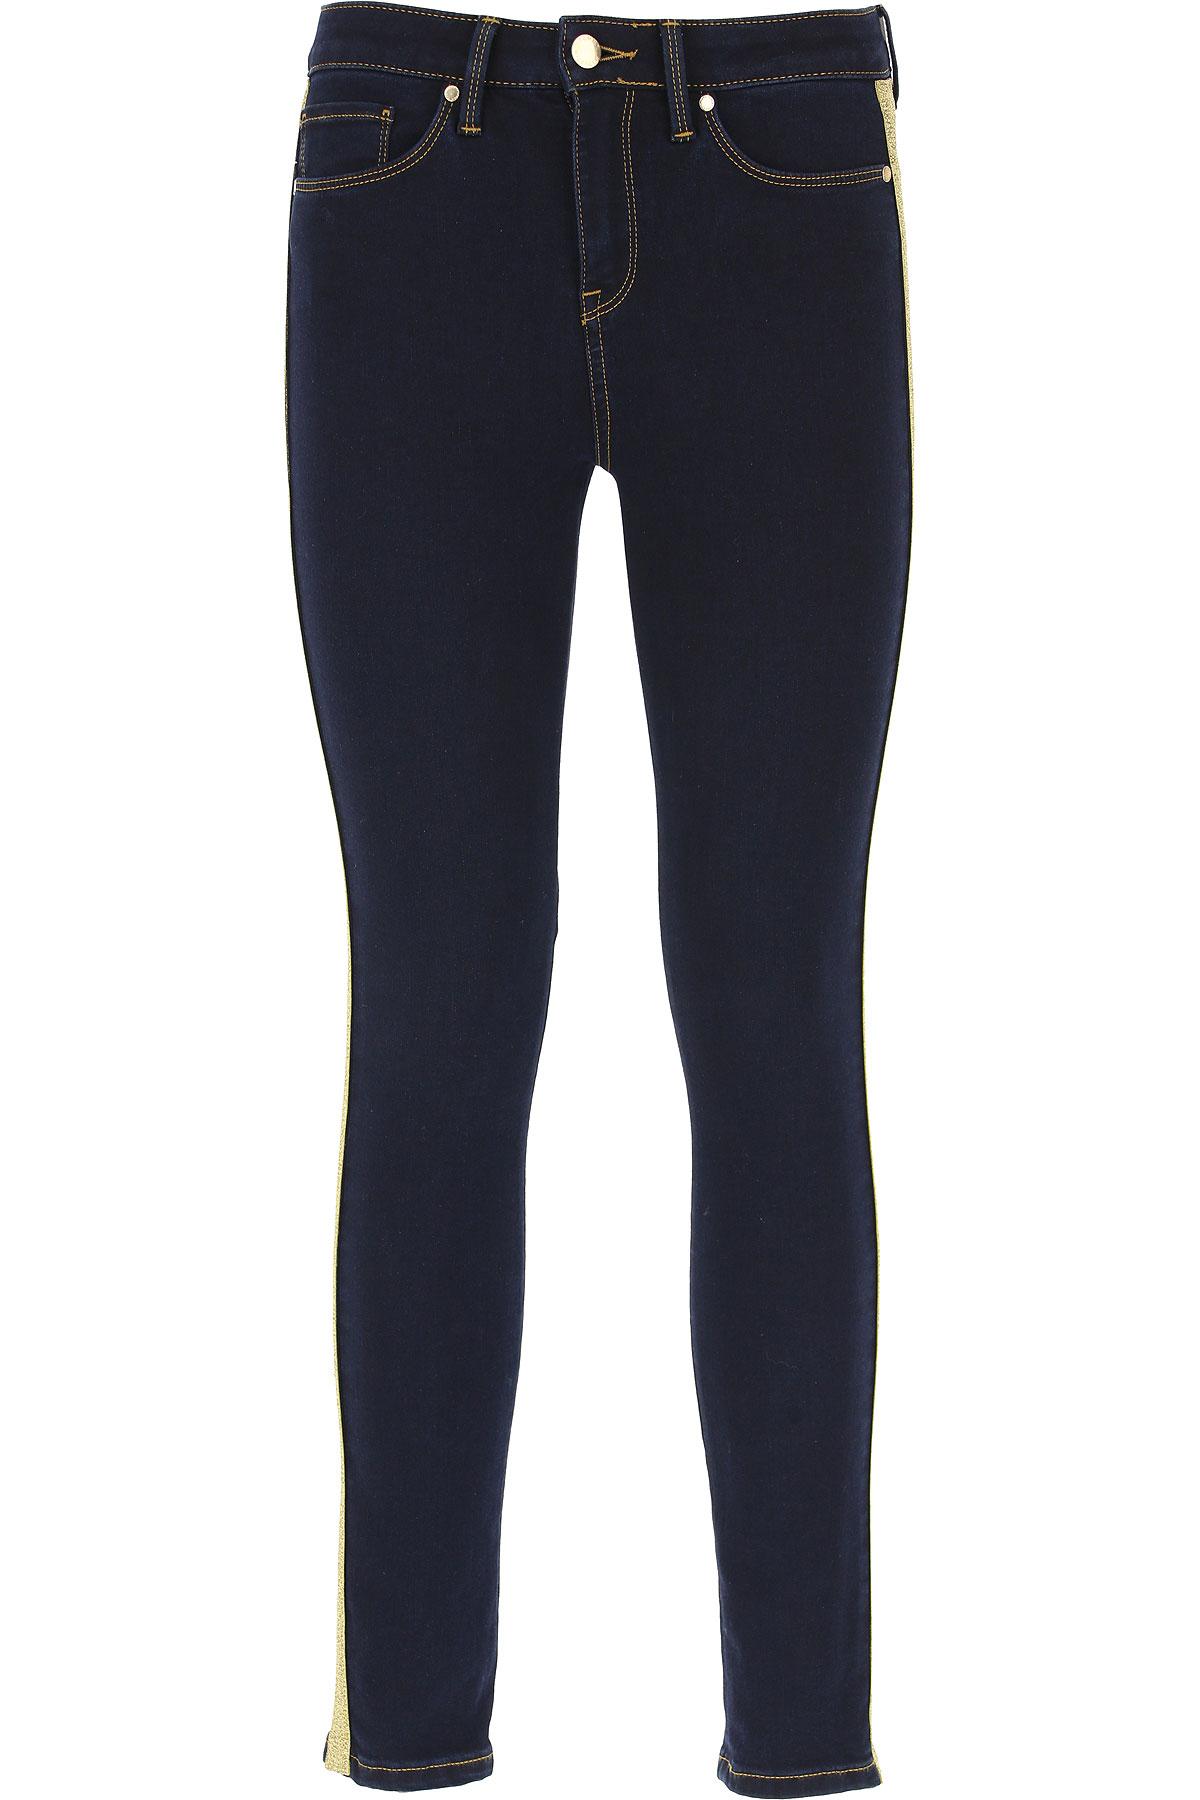 Tommy Hilfiger Jeans On Sale, Denim, Cotton, 2017, 26 28